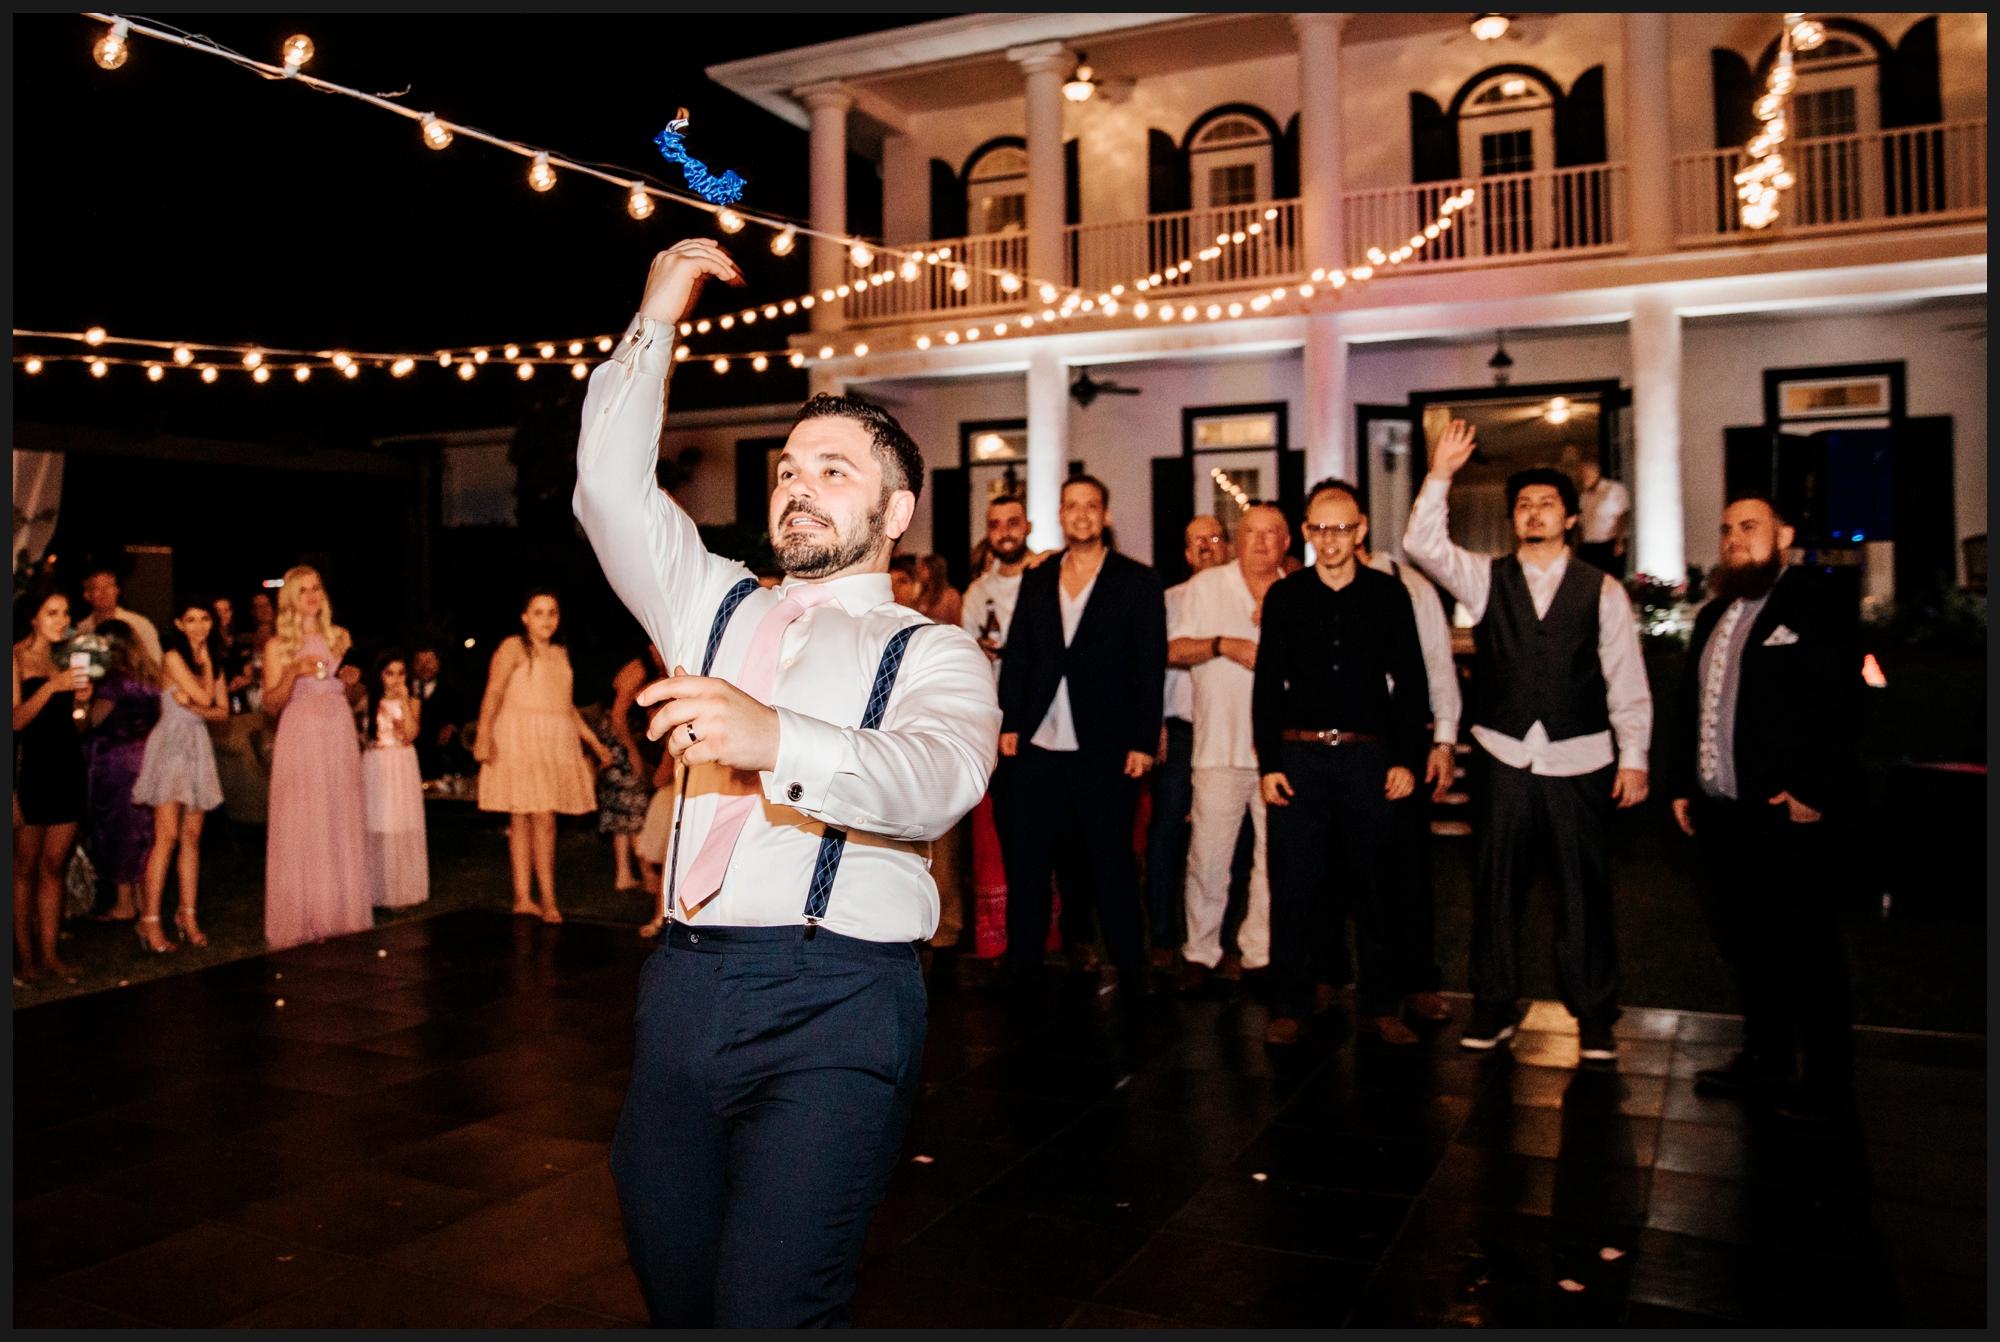 Orlando-Wedding-Photographer-destination-wedding-photographer-florida-wedding-photographer-hawaii-wedding-photographer_0626.jpg